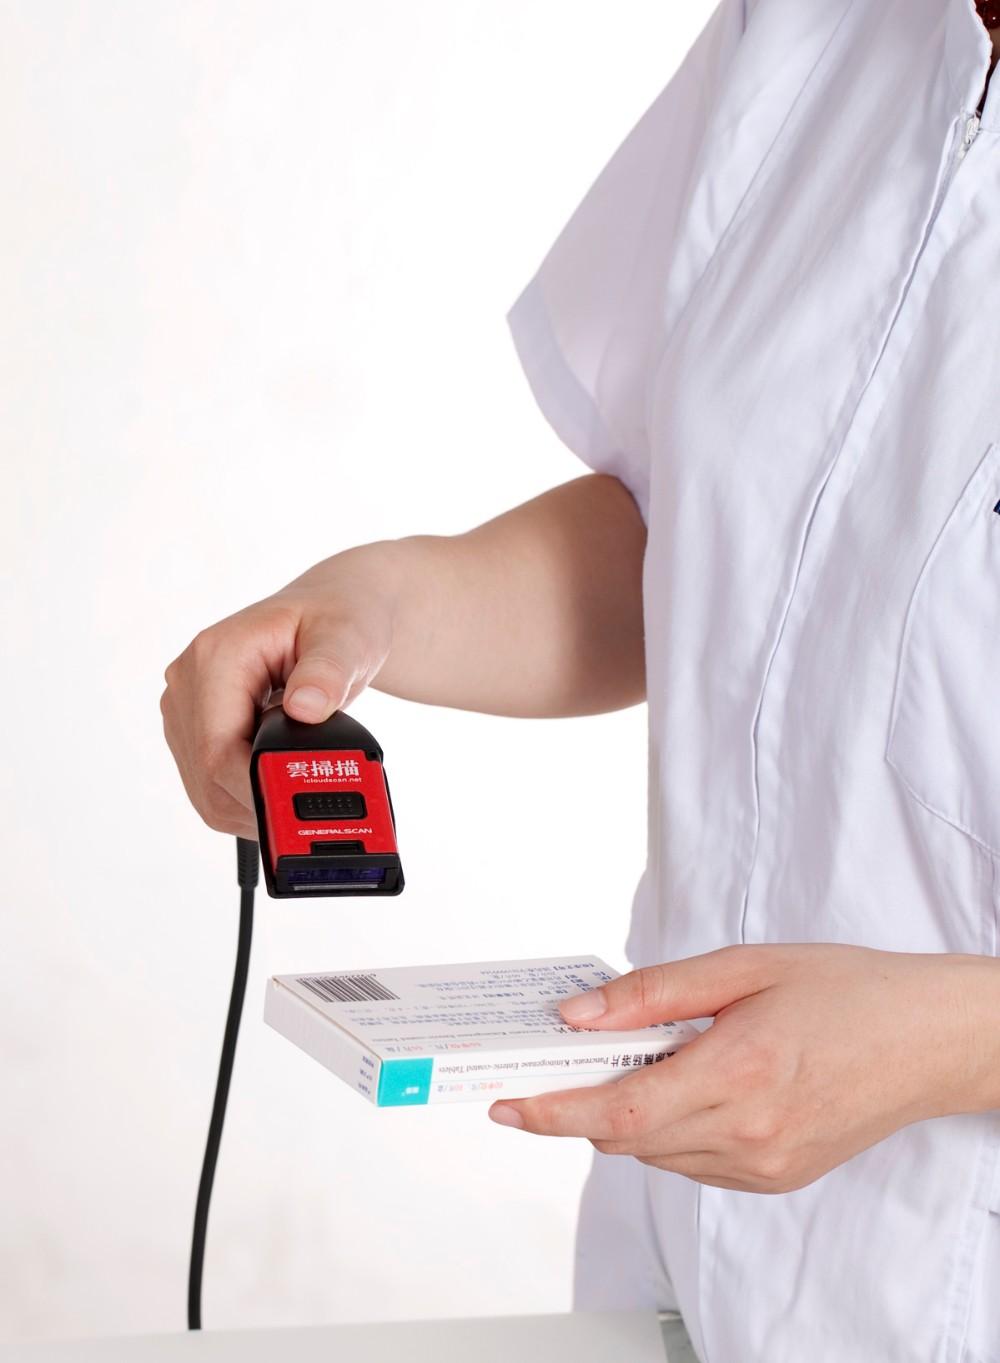 Mini Bluetooth Reader Tiny Wireless Barcode Scanner 01